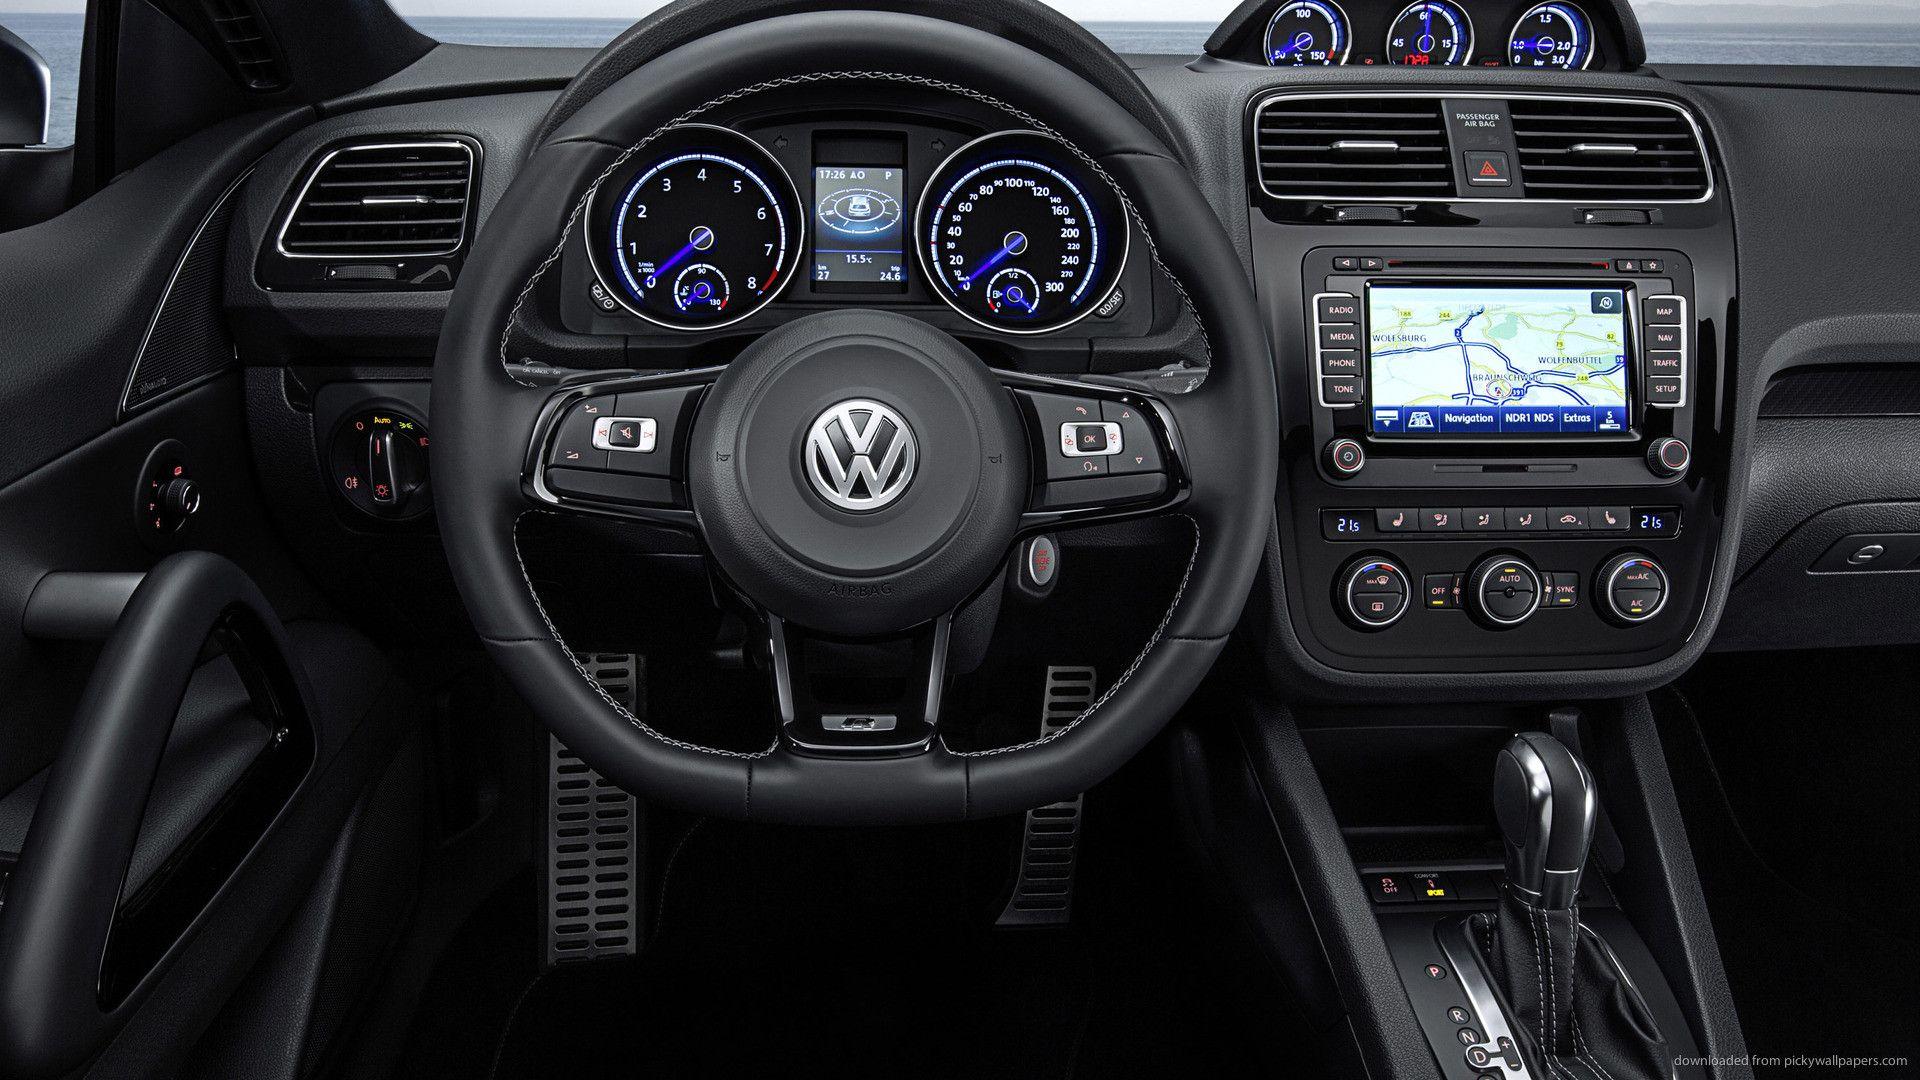 1920x1080 Volkswagen Scirocco Interior Picture Vw Scirocco Volkswagen Scirocco Volkswagen